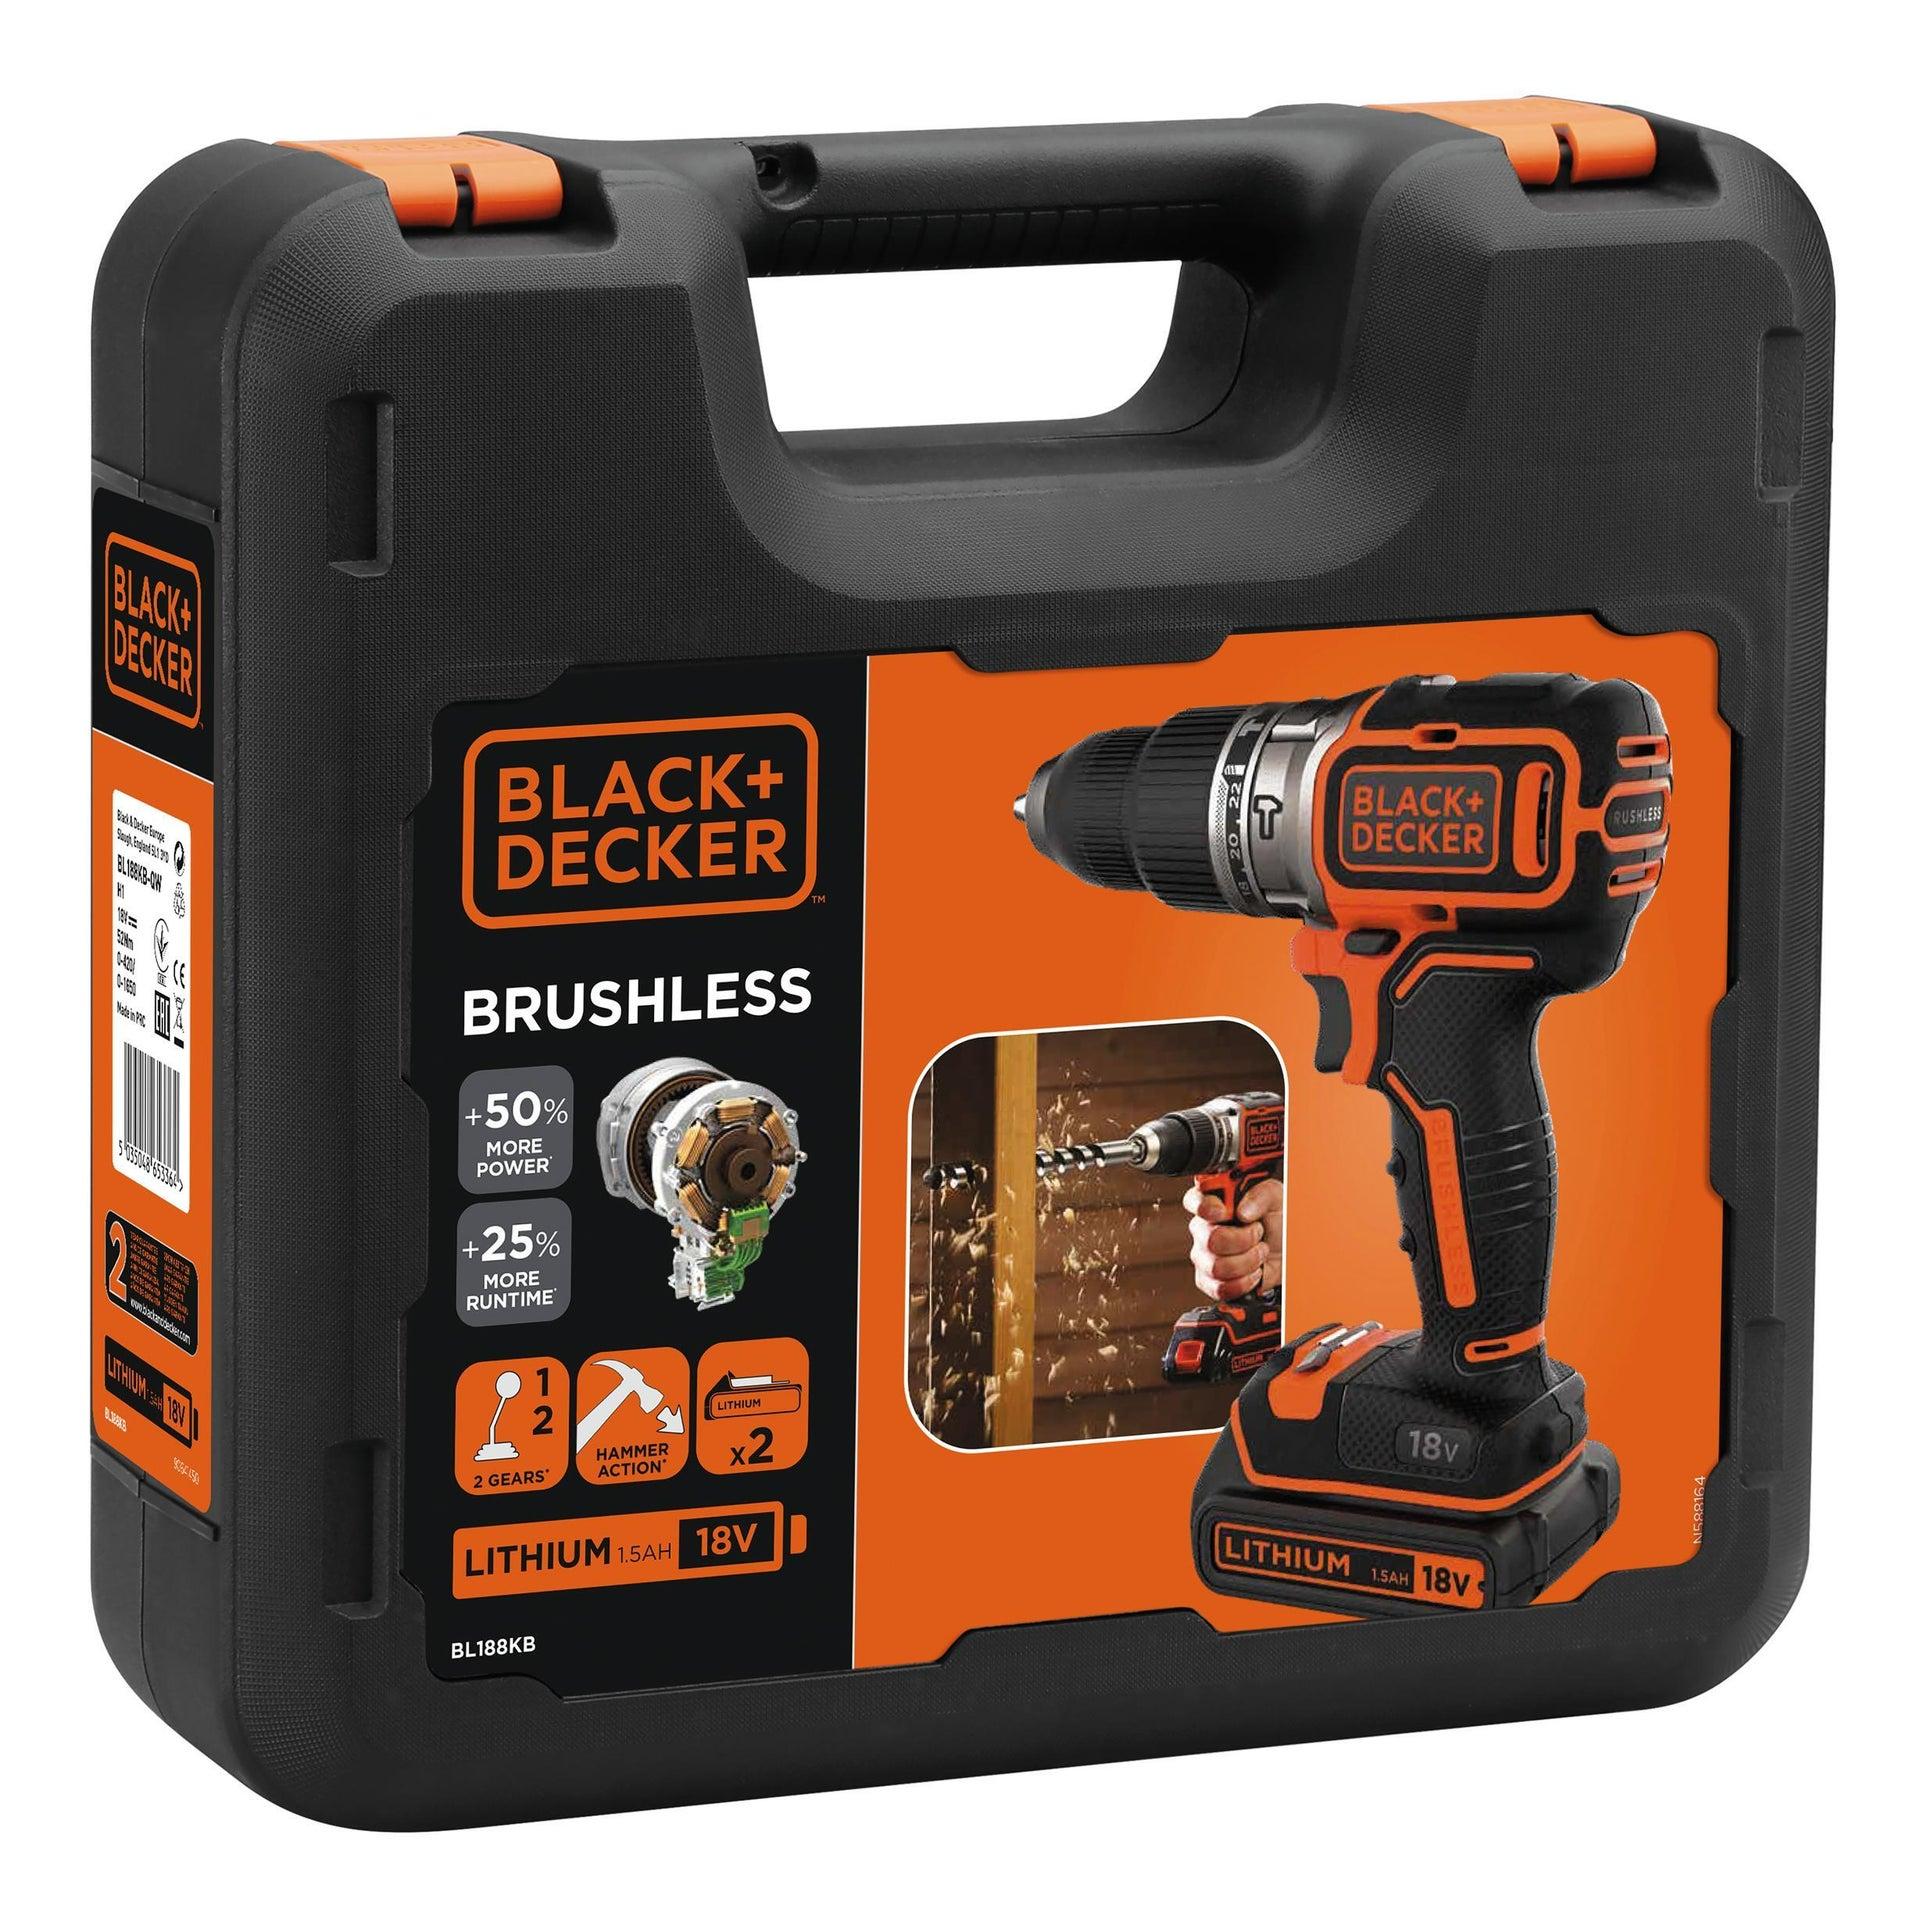 Trapano avvitatore a batteria BLACK + DECKER BL188KB-QW 18 V, 1.5 Ah, 2 batterie - 2